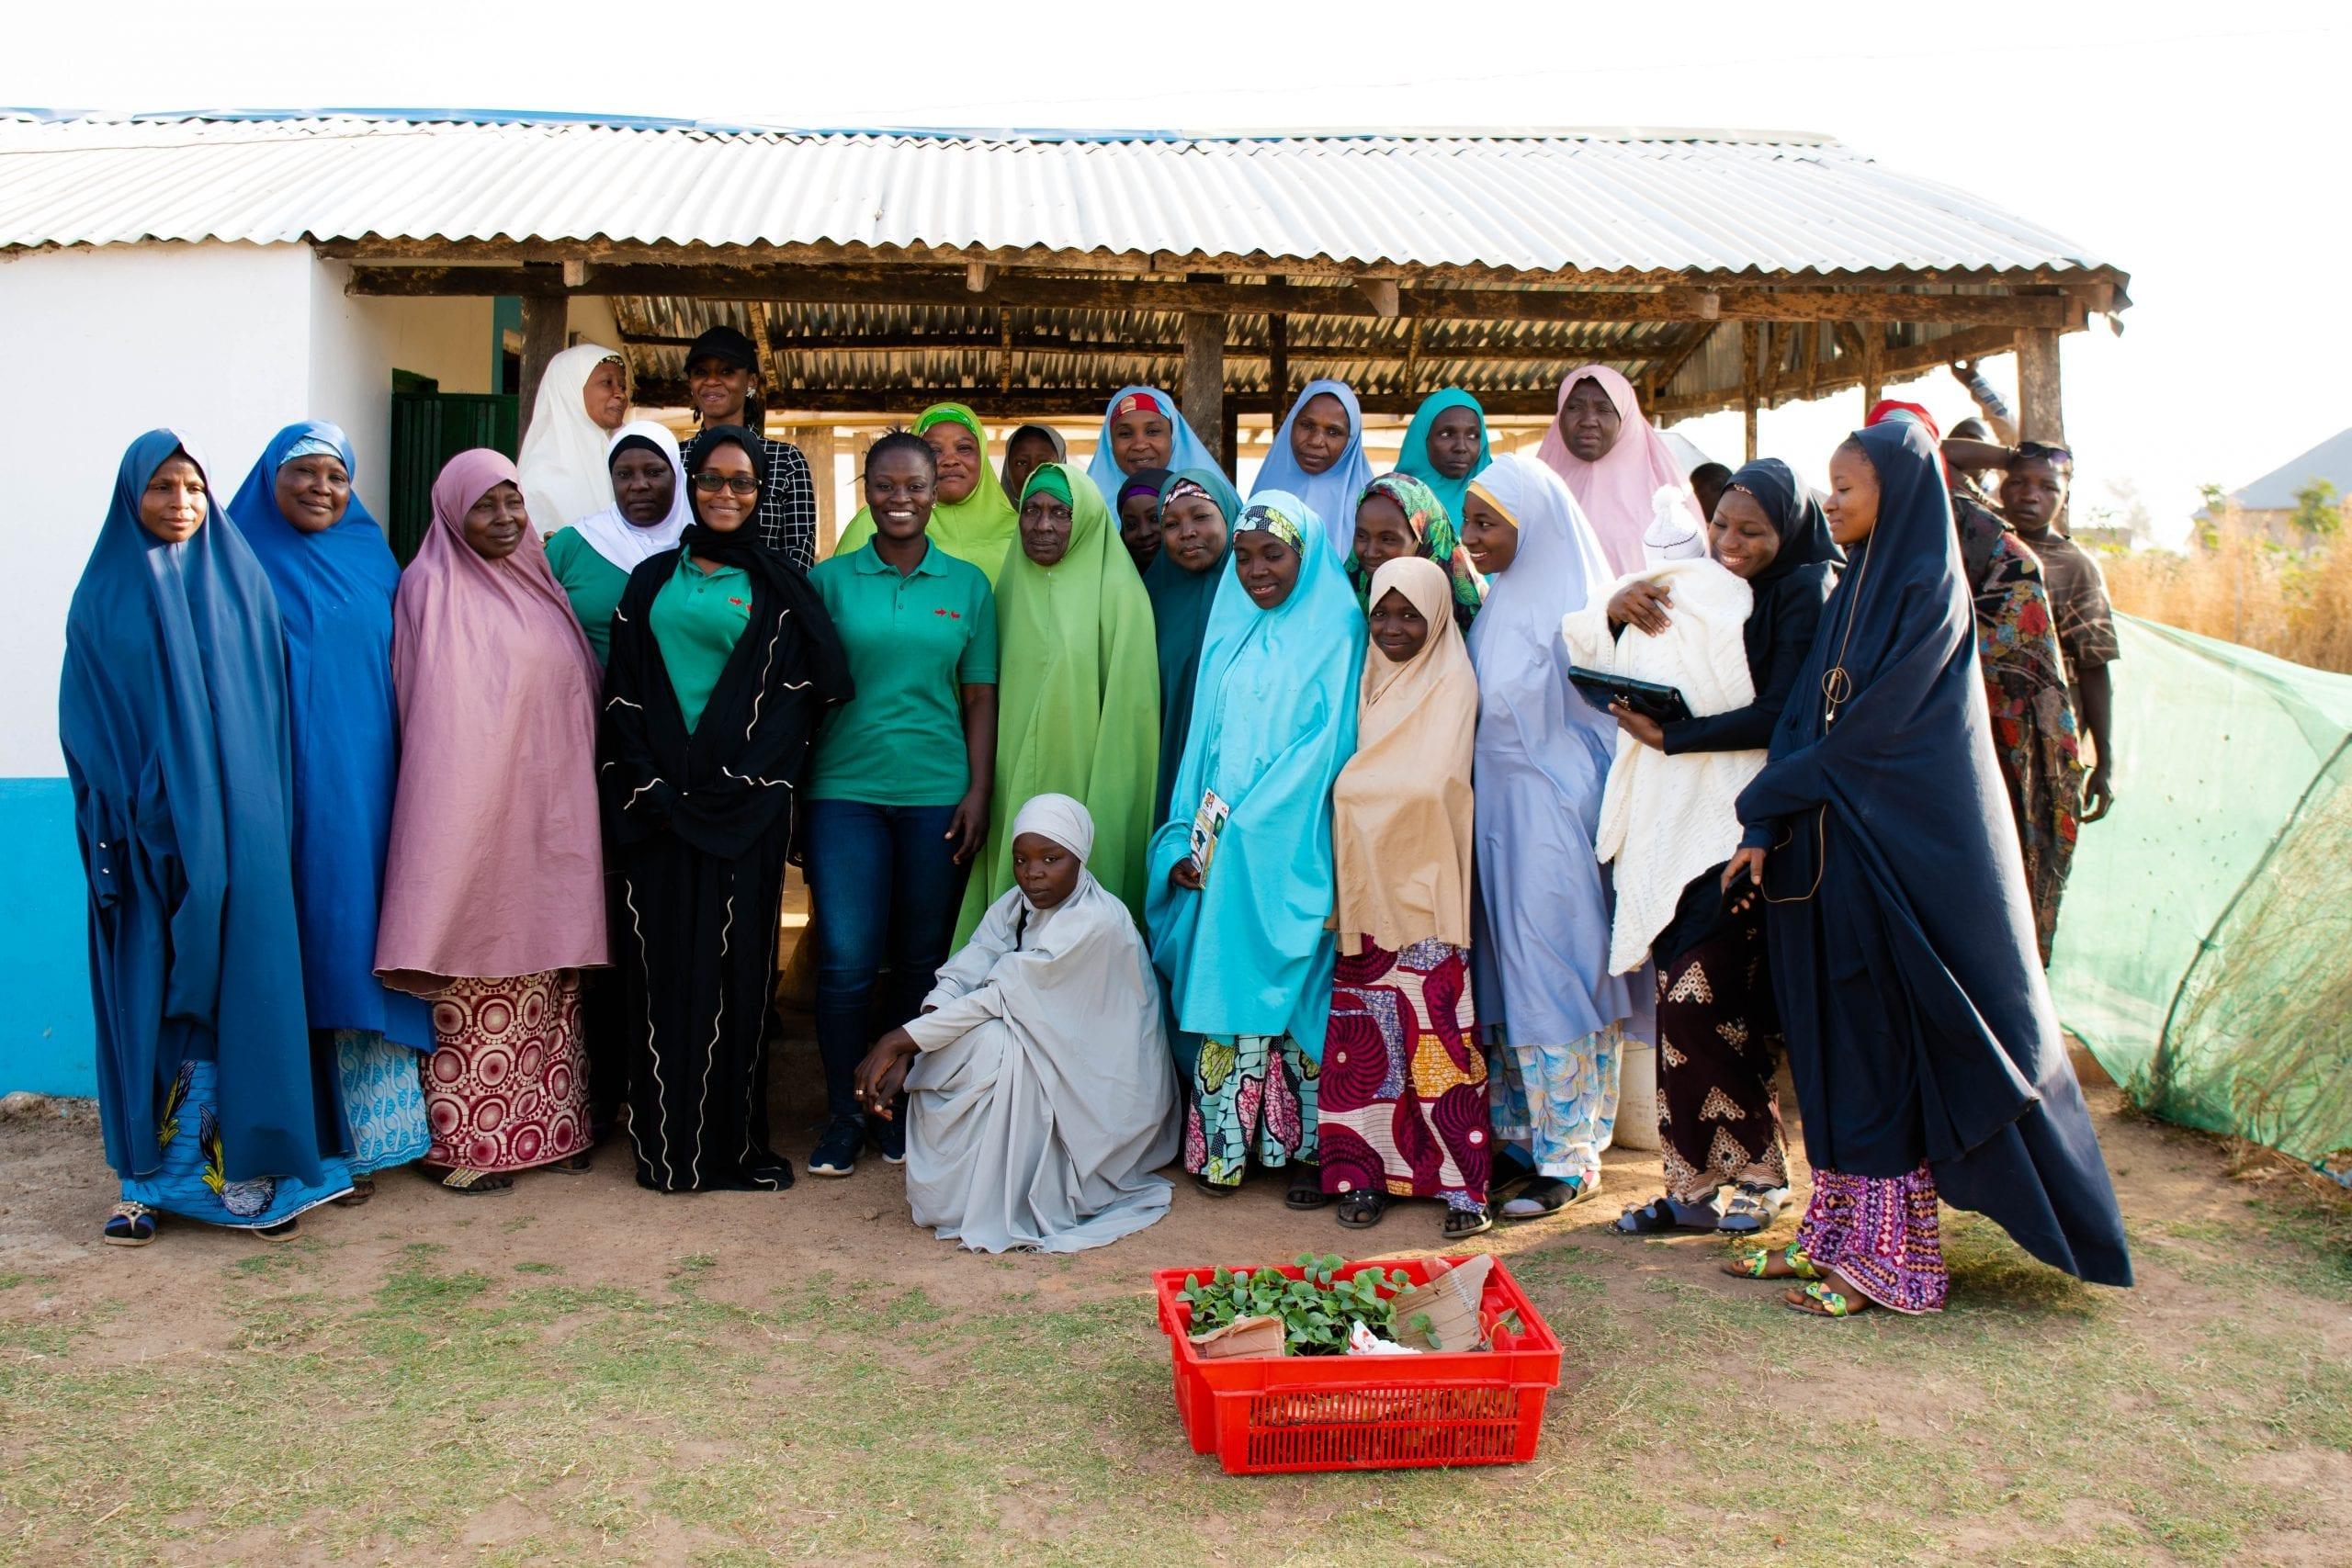 Women cottage tomato processors gather in northwest Nigeria